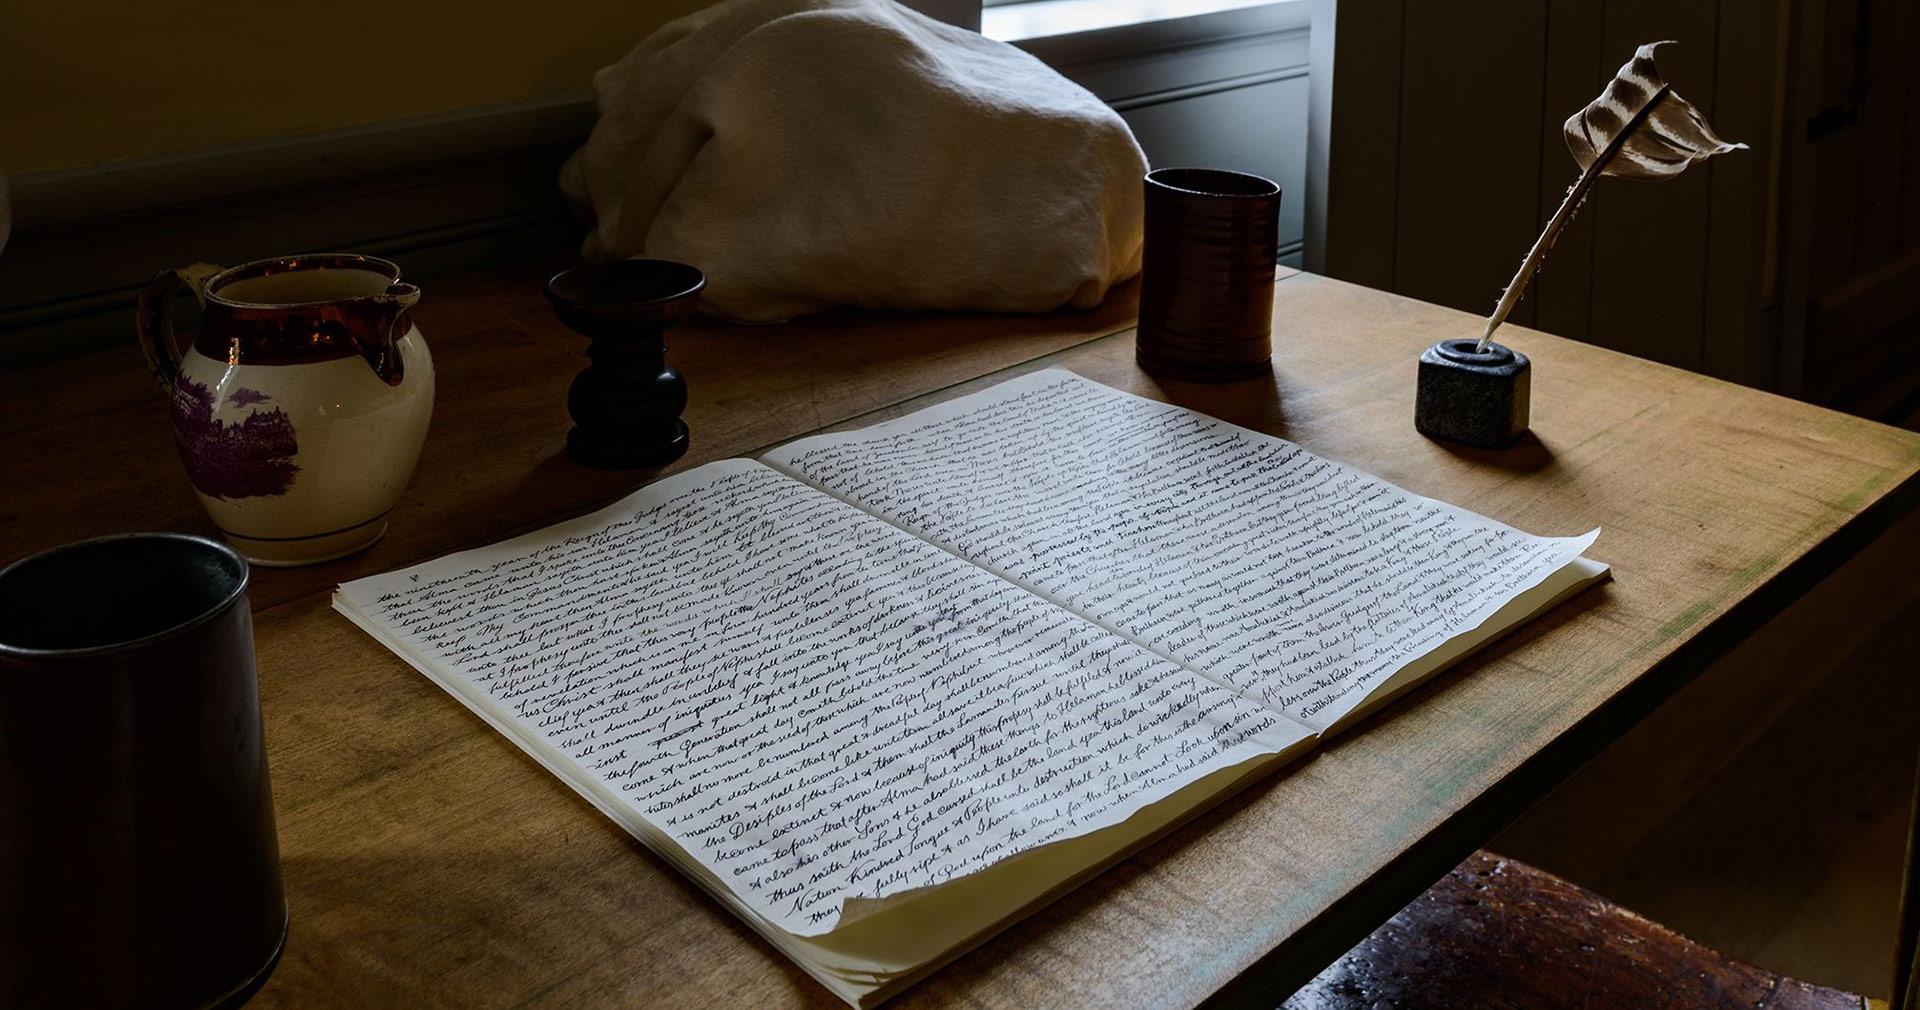 Replica of the Original Manuscript of the Book of Mormon. Image via Church of Jesus Christ.